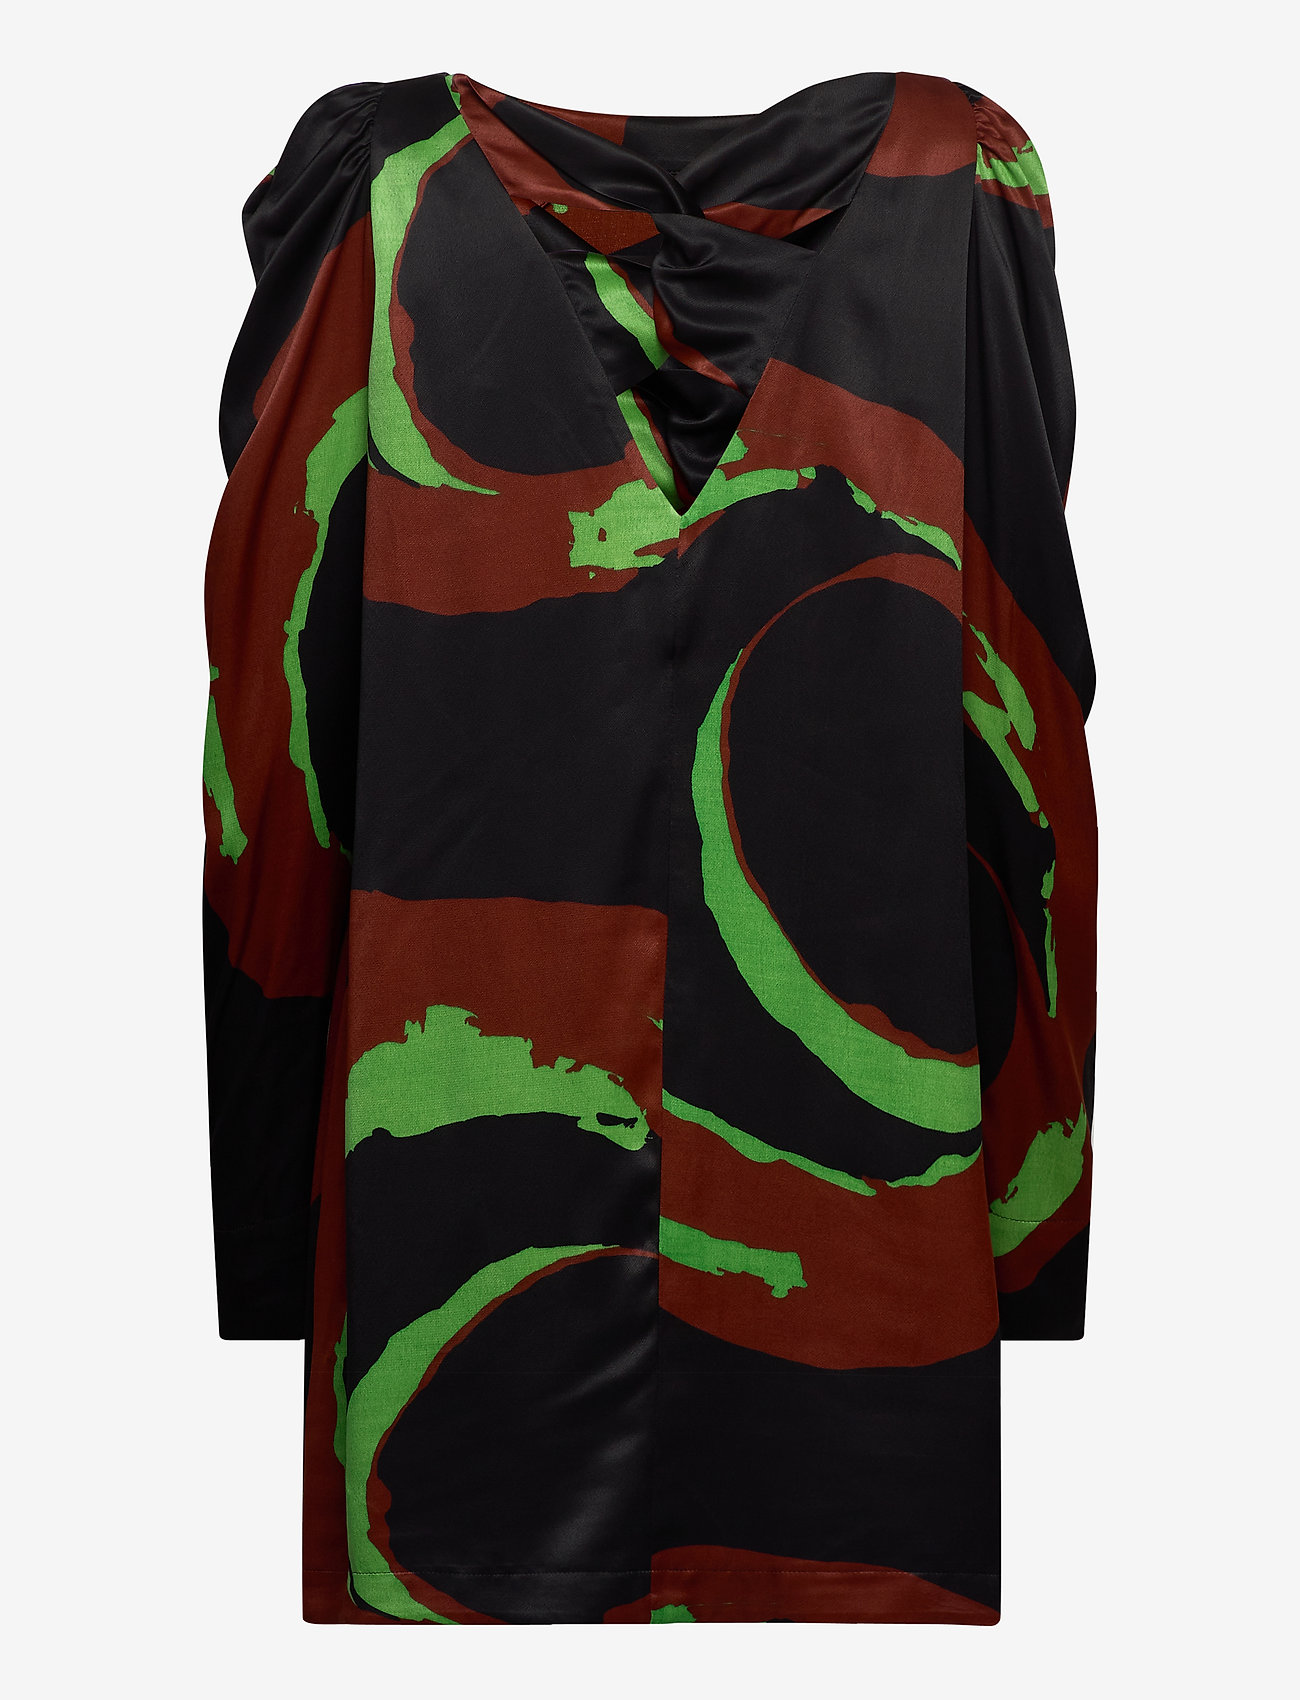 Rodebjer Novena   - RODEBJER -  Women's Dresses Clearance